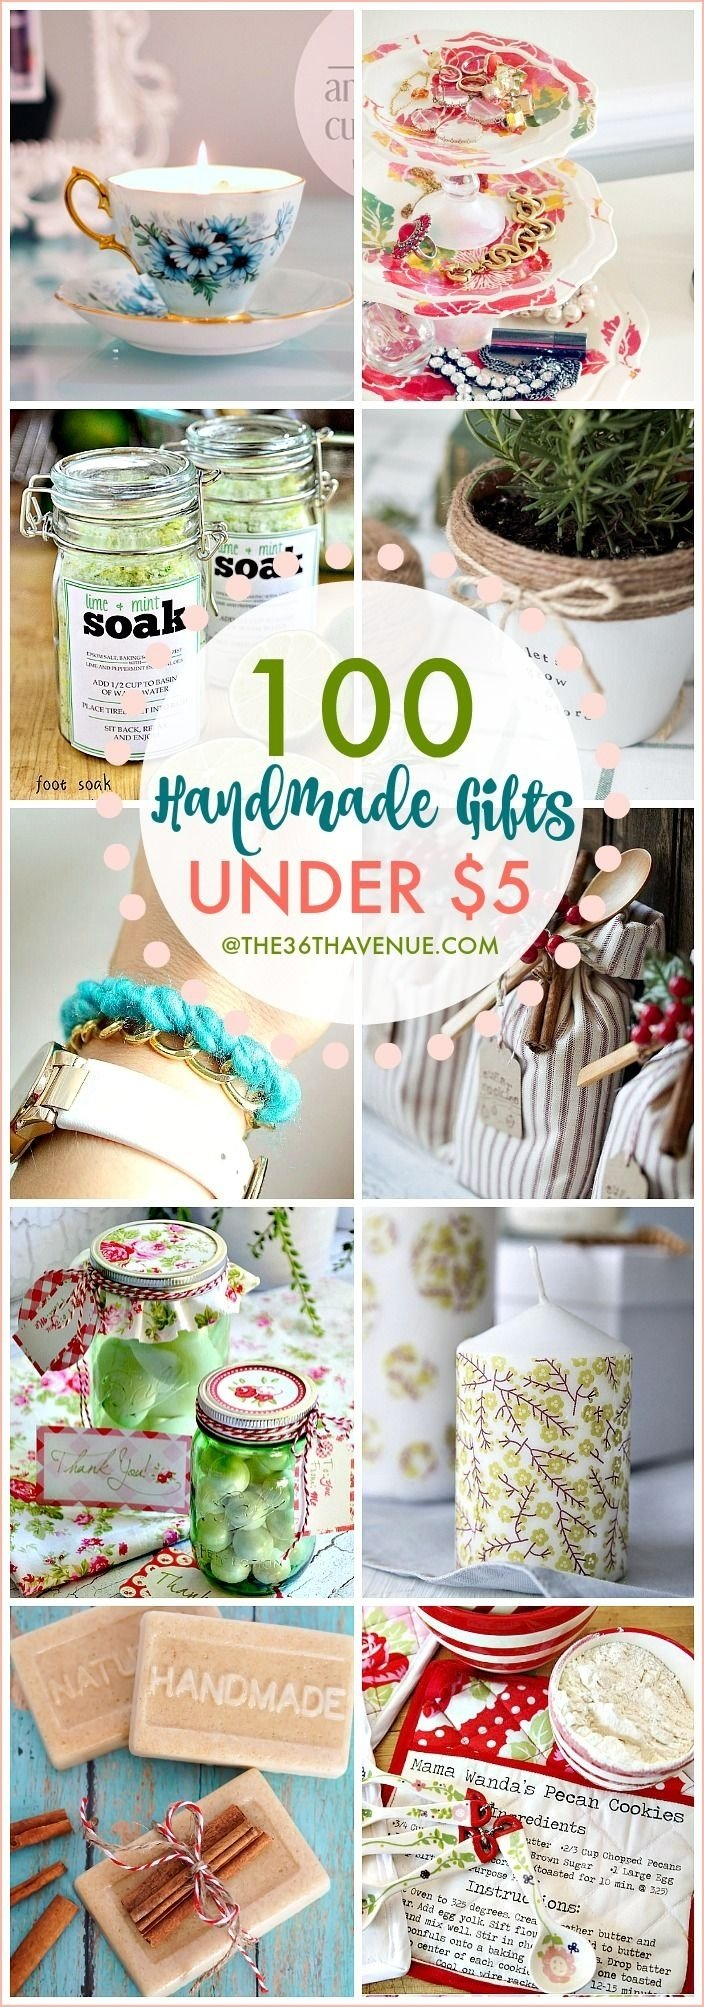 10 Spectacular Homemade Gift Ideas For Girls 51 best diy gift ideas images on pinterest diy presents gift 1 2021